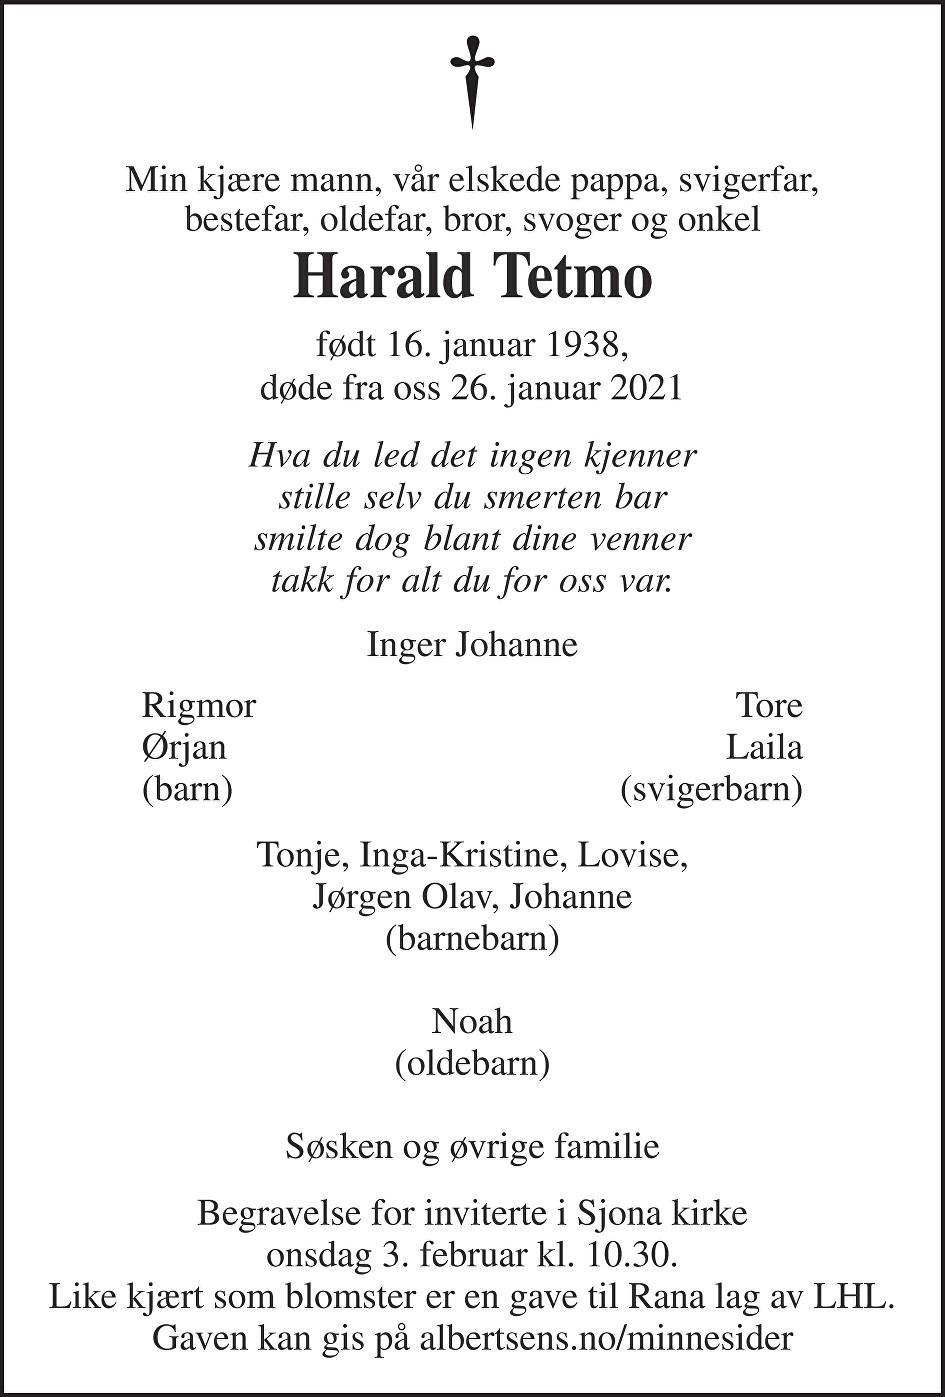 Harald Tetmo Dødsannonse